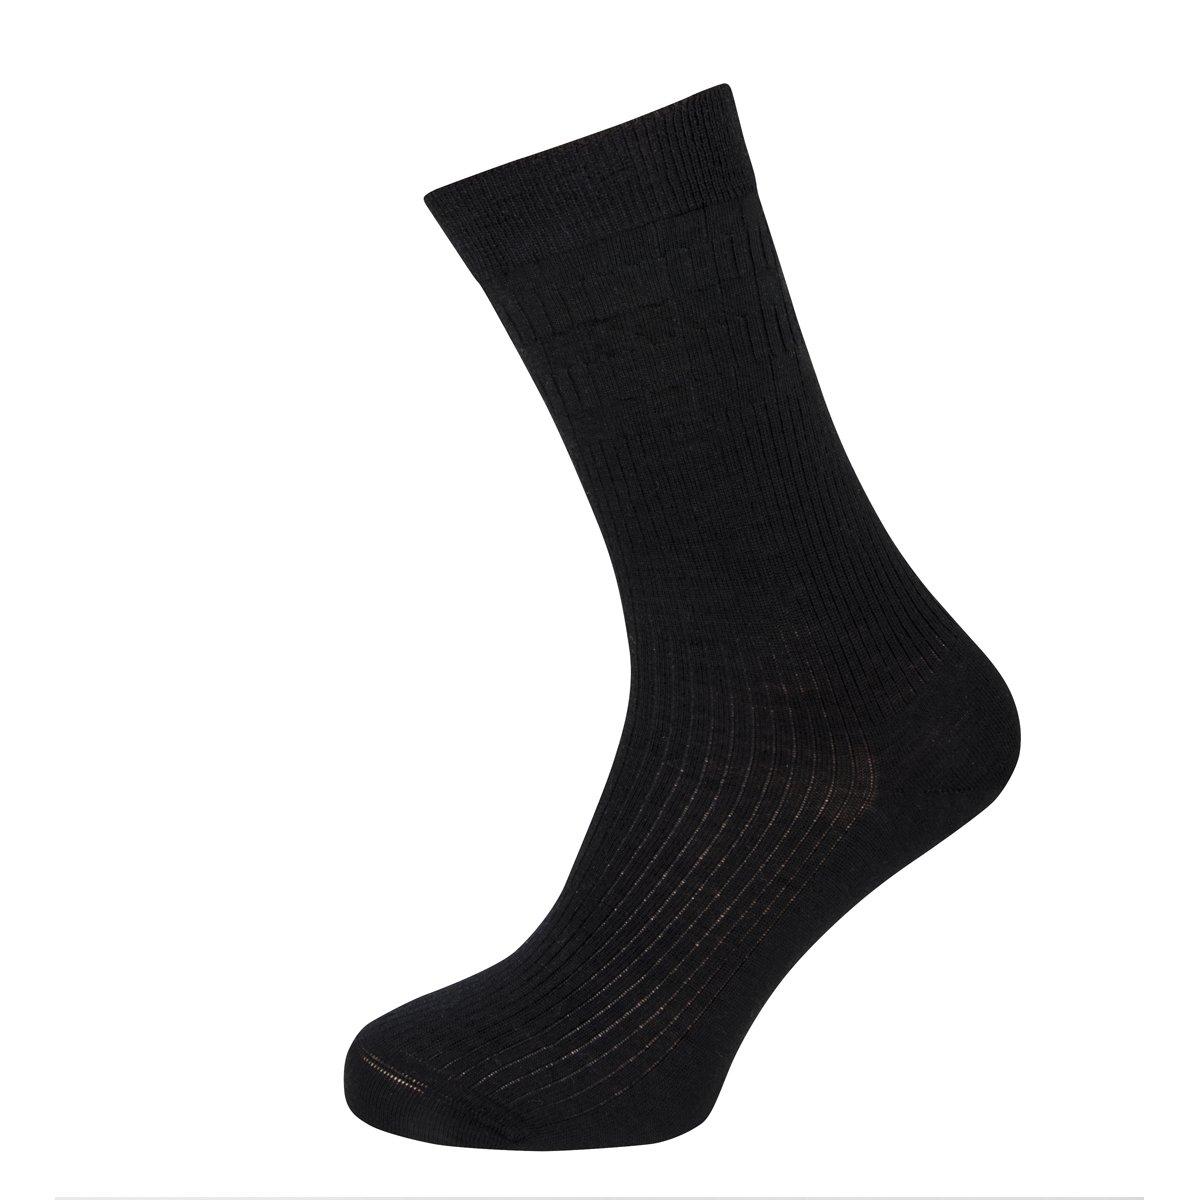 dsc tag socks comfortable comforter most fleece toot advertisements